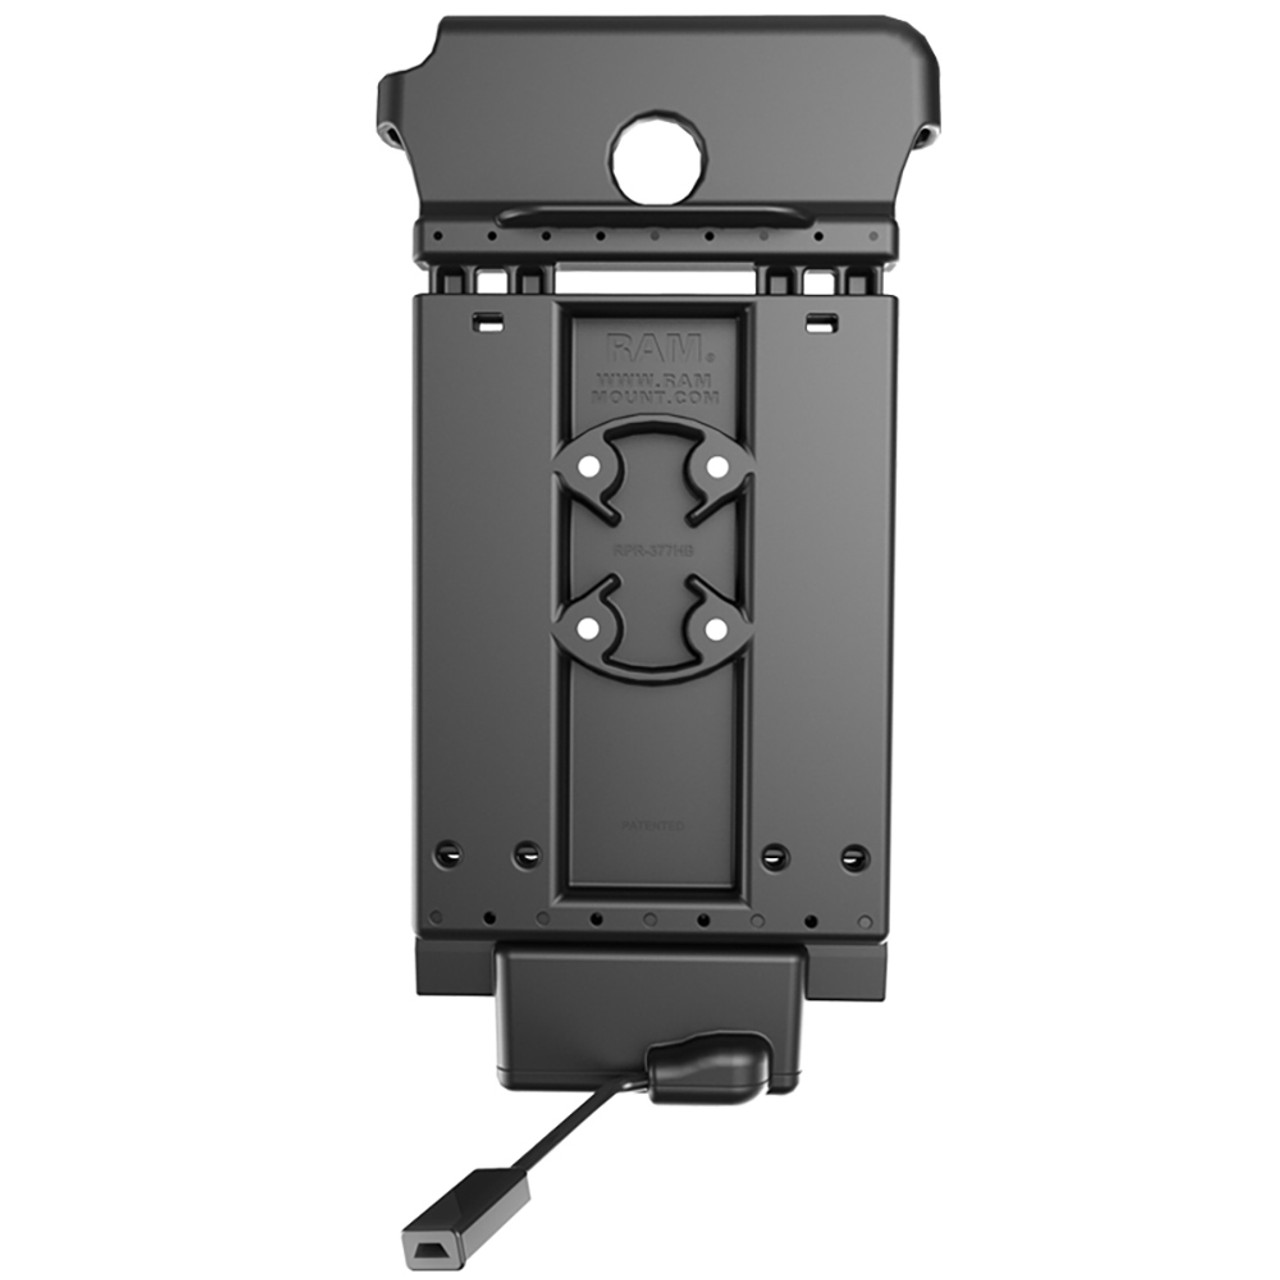 RAM Mount GDS Vehicle Dock f\/Samsung Galaxy Tab Active 8.0 [RAM-GDS-DOCK-V2-SAM17U]